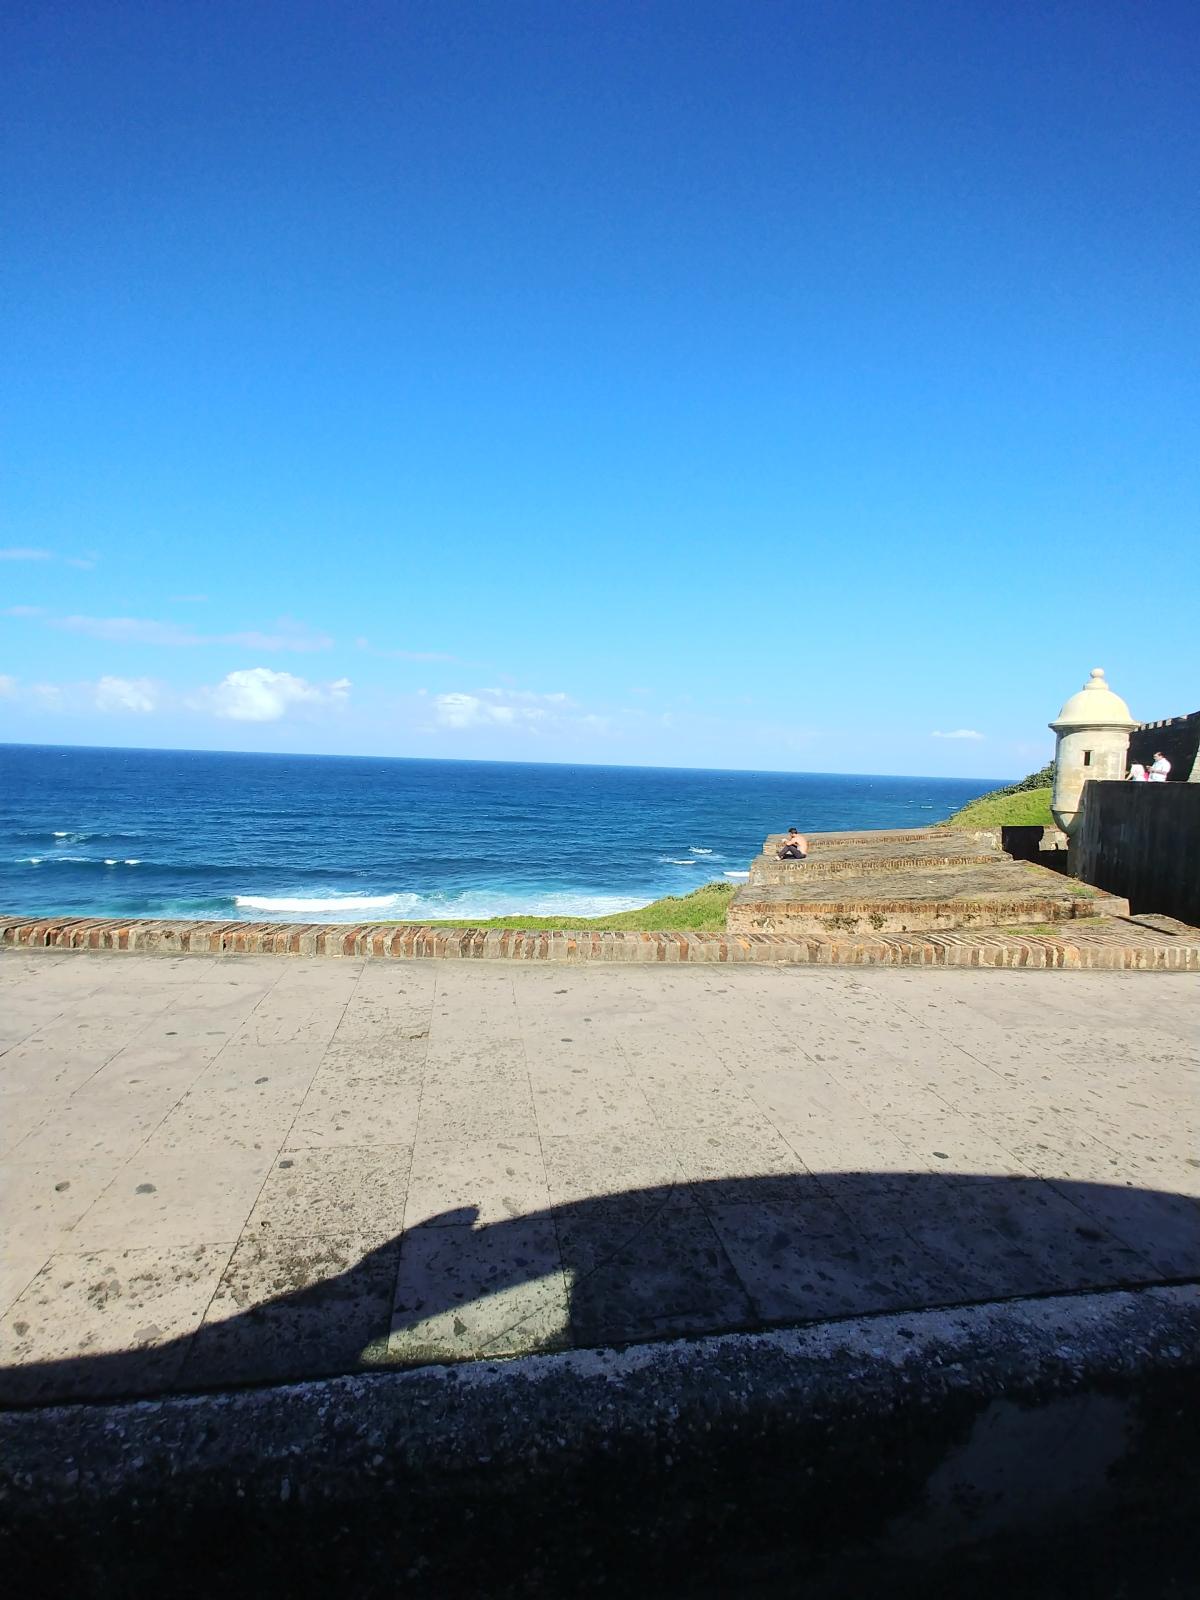 Experience Old San Juan, PuertoRico